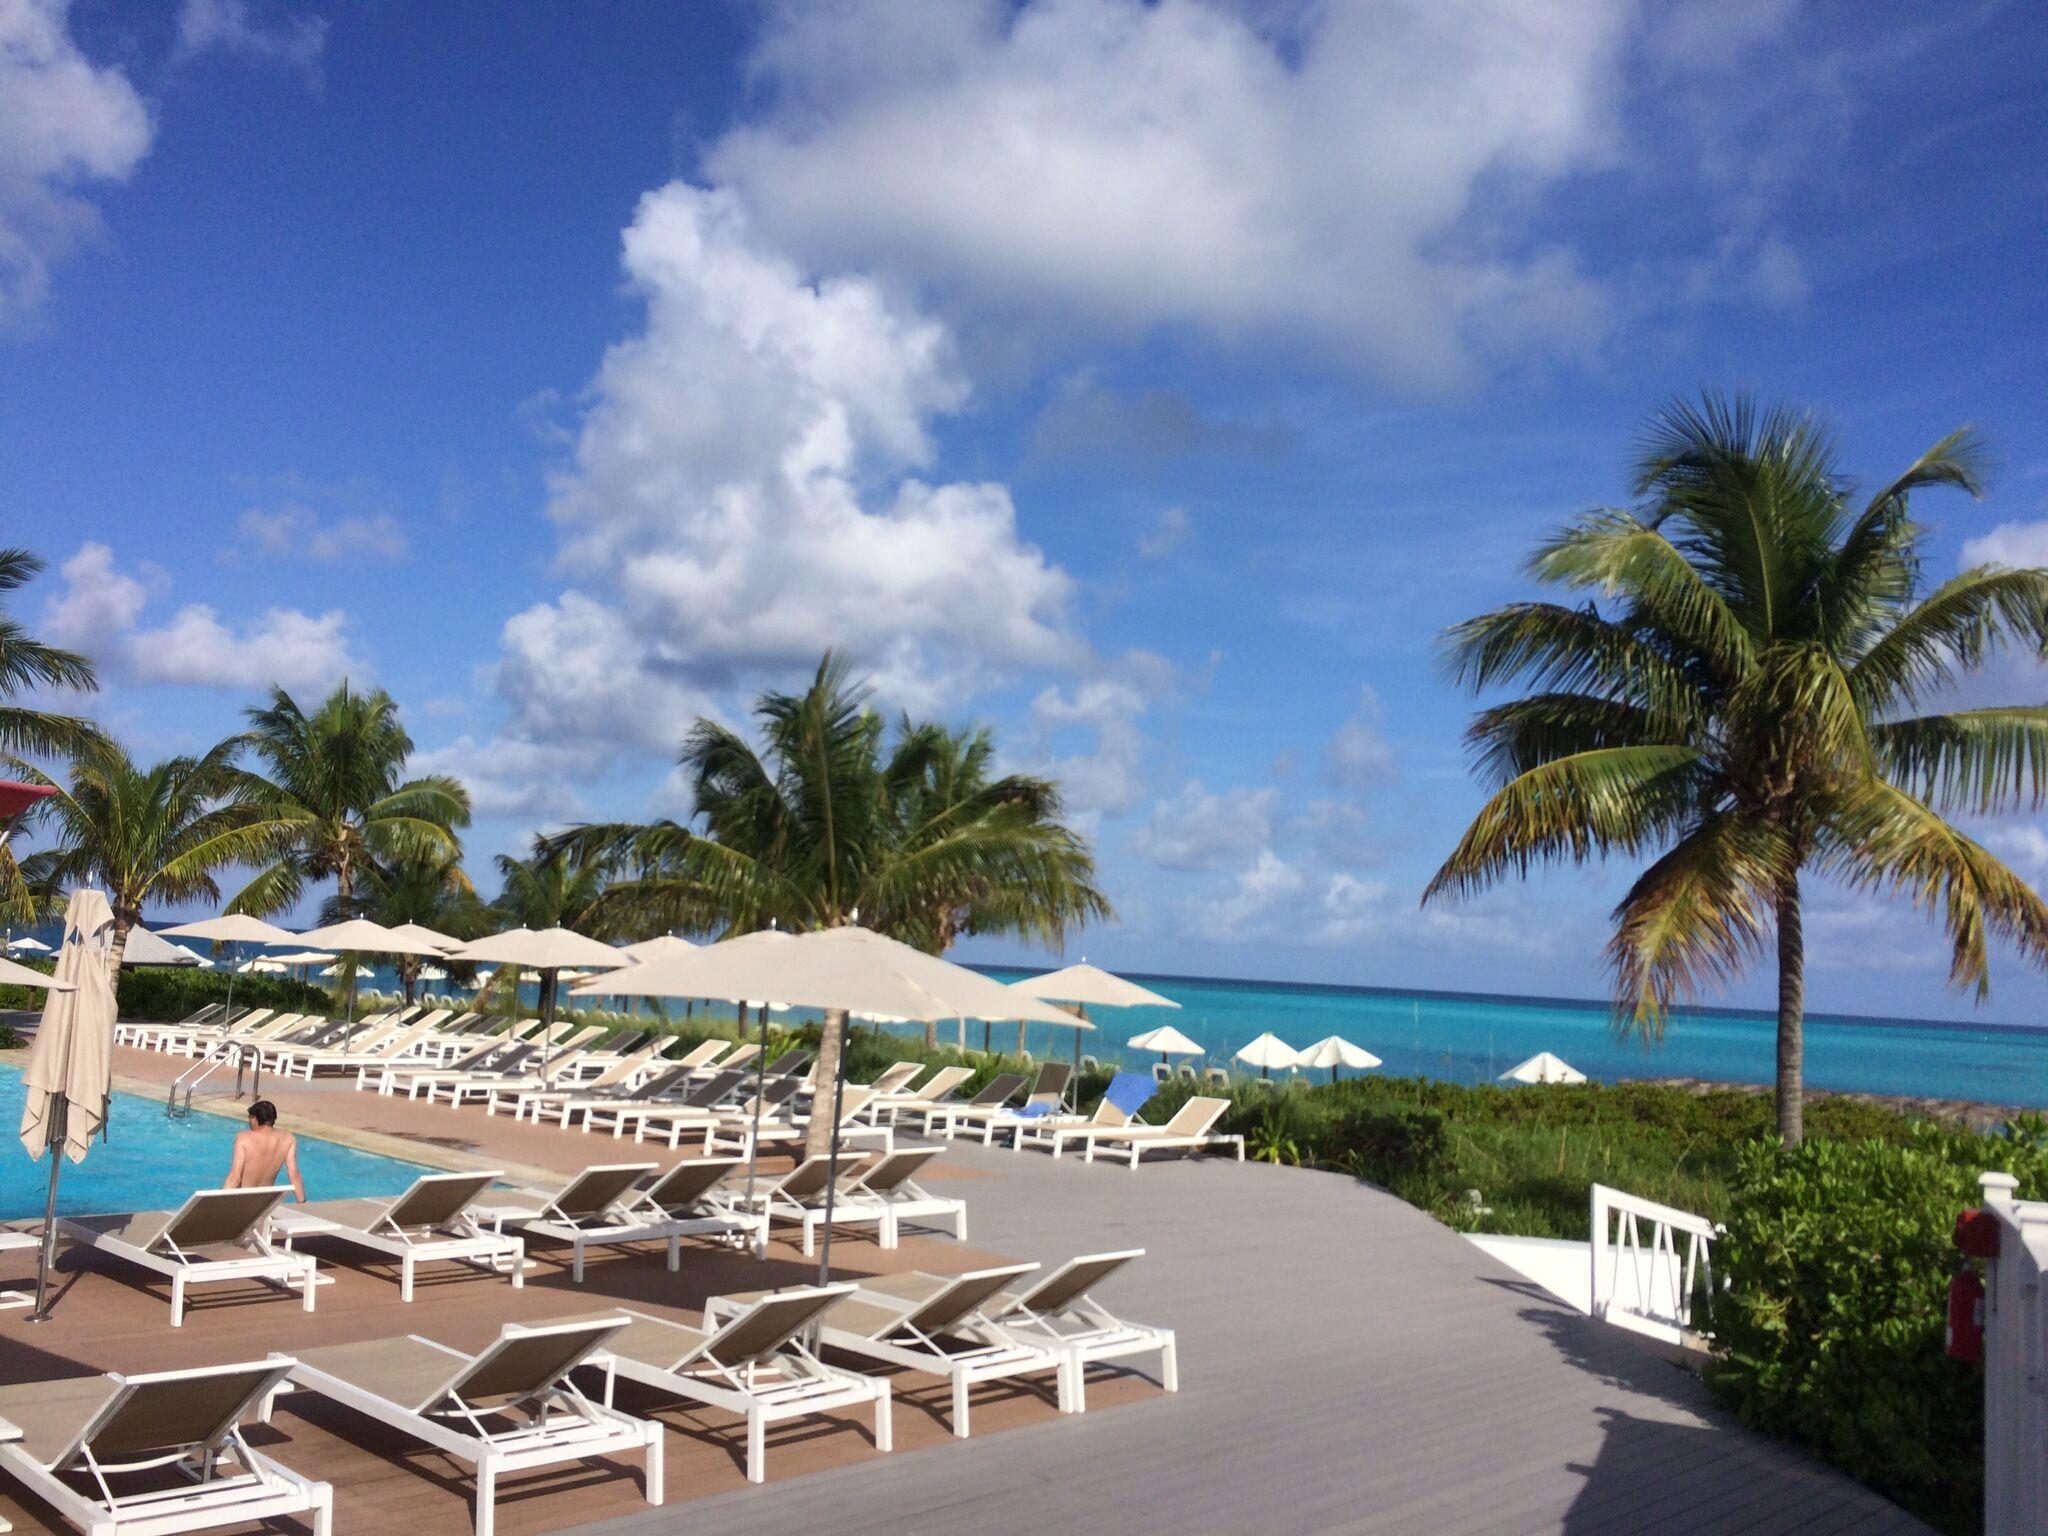 Club Med Columbus - Bahamas